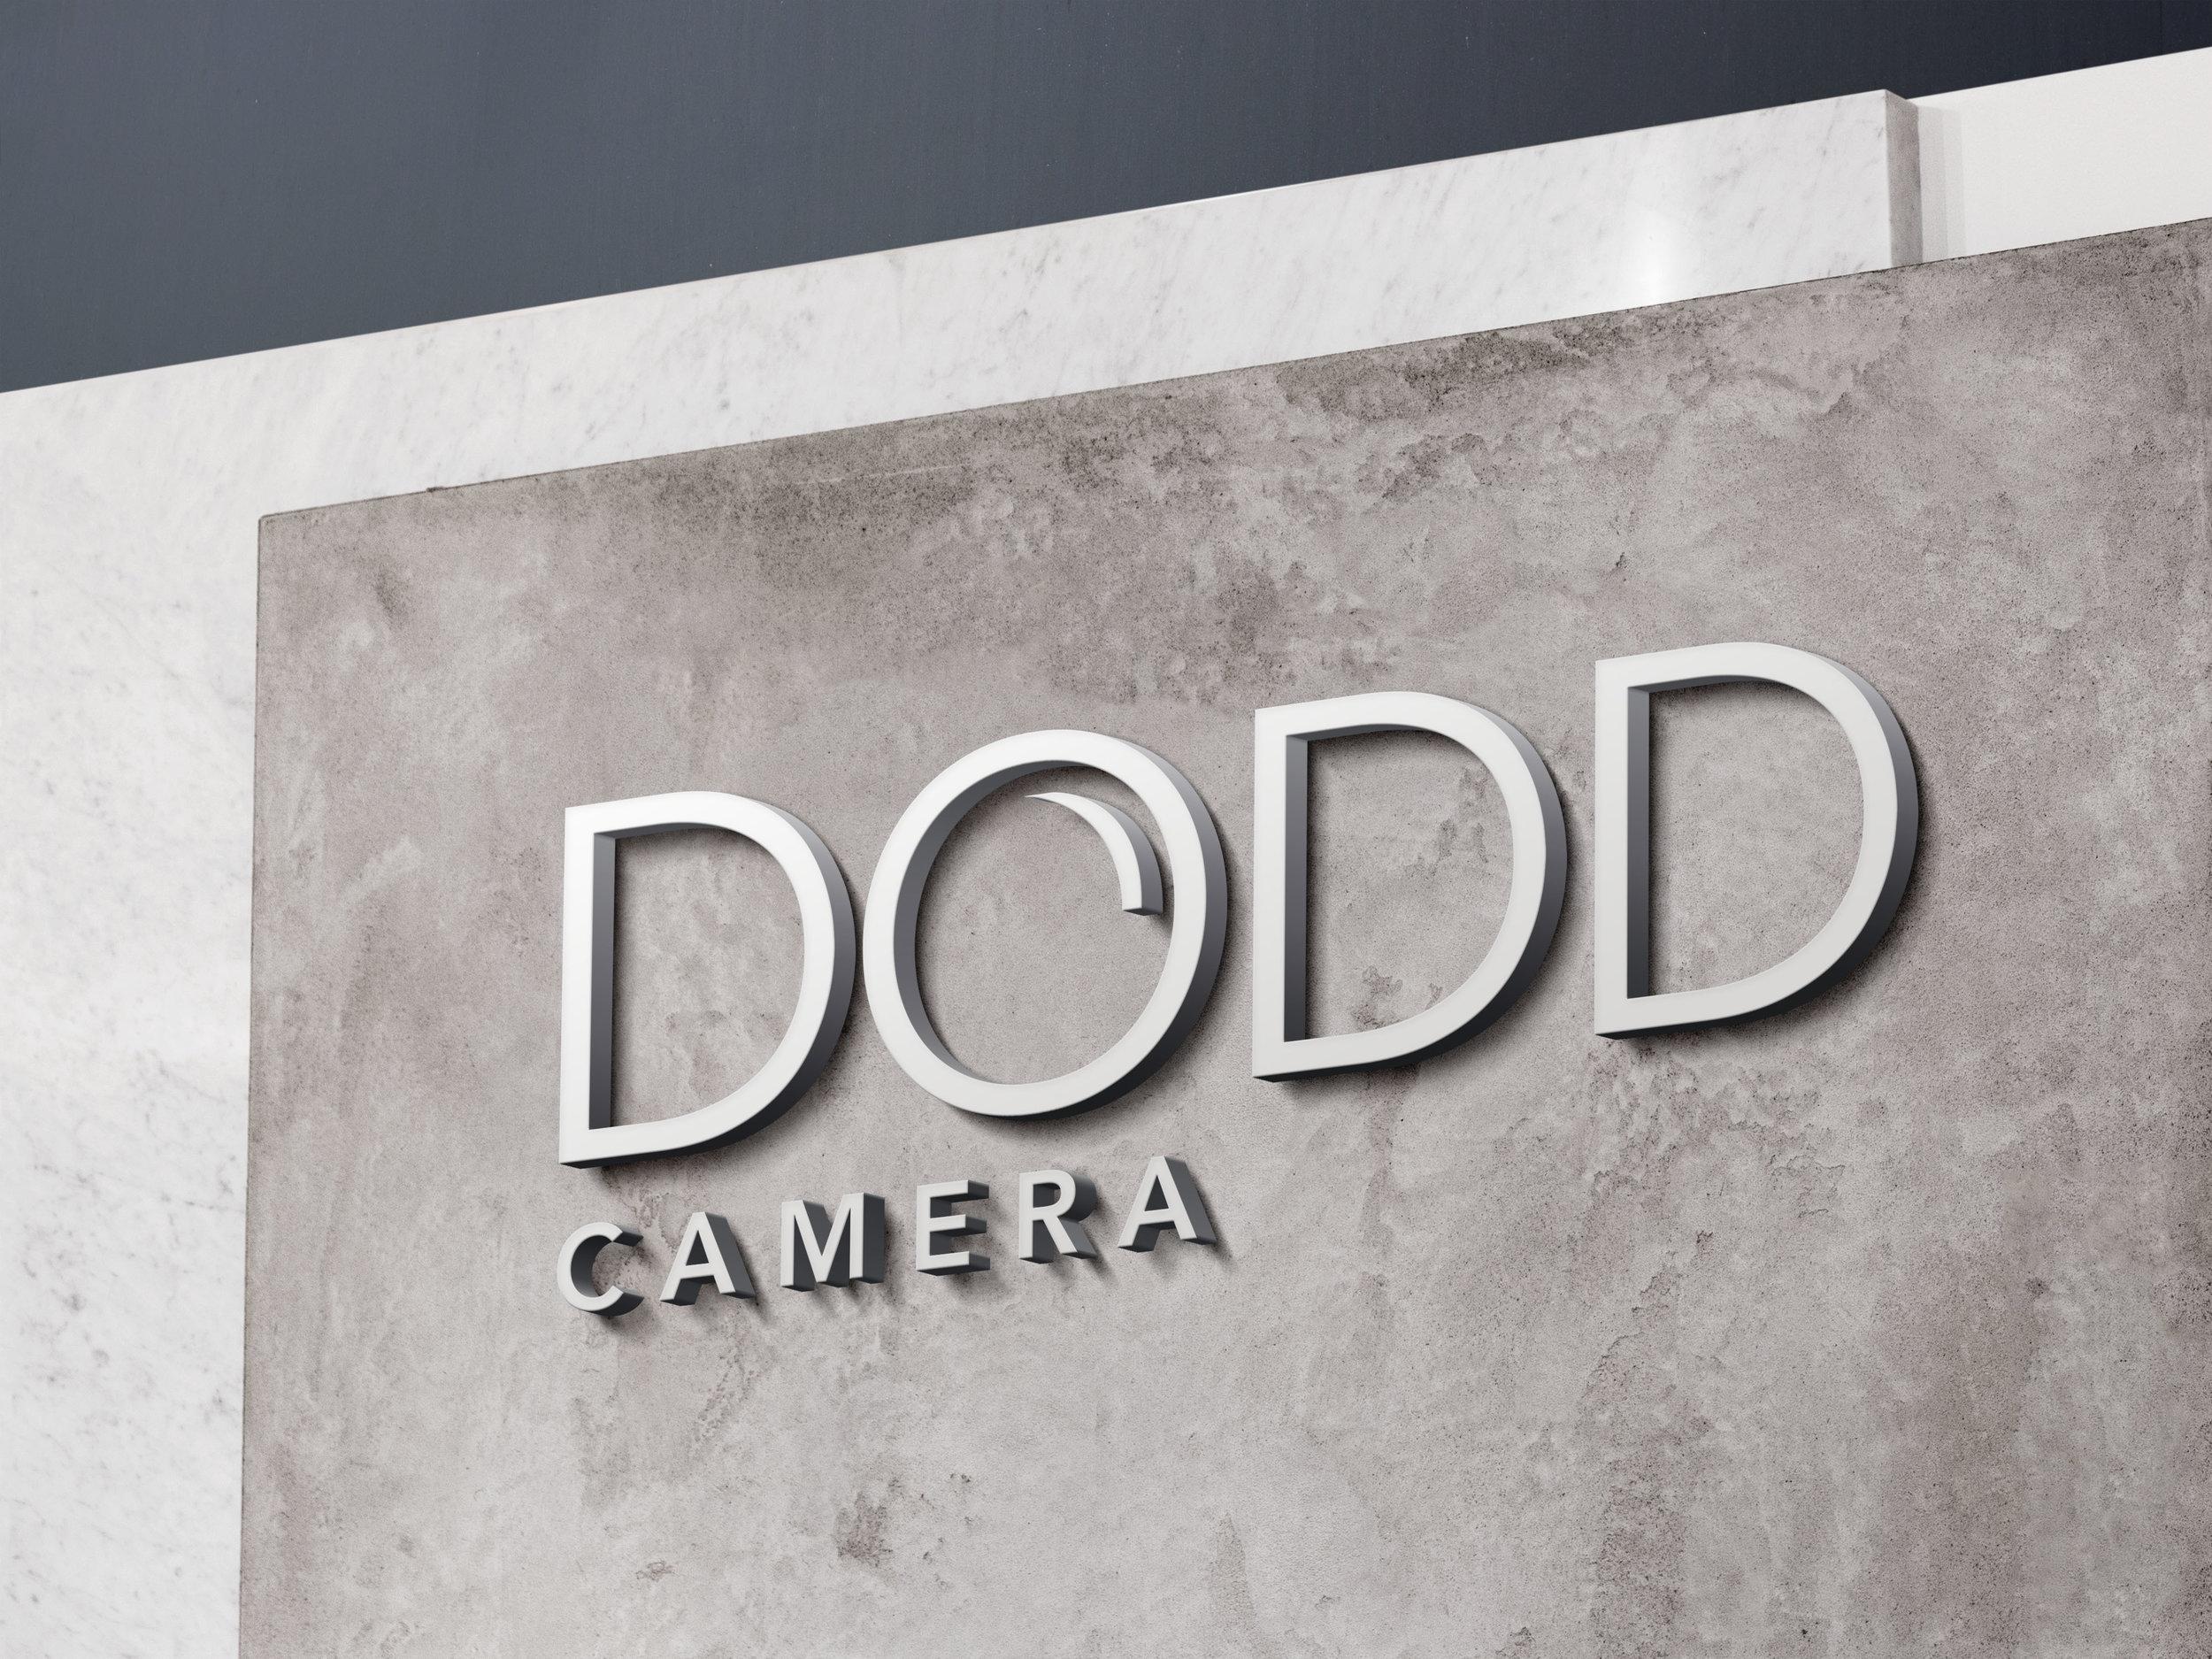 DODD_Engrave.jpg